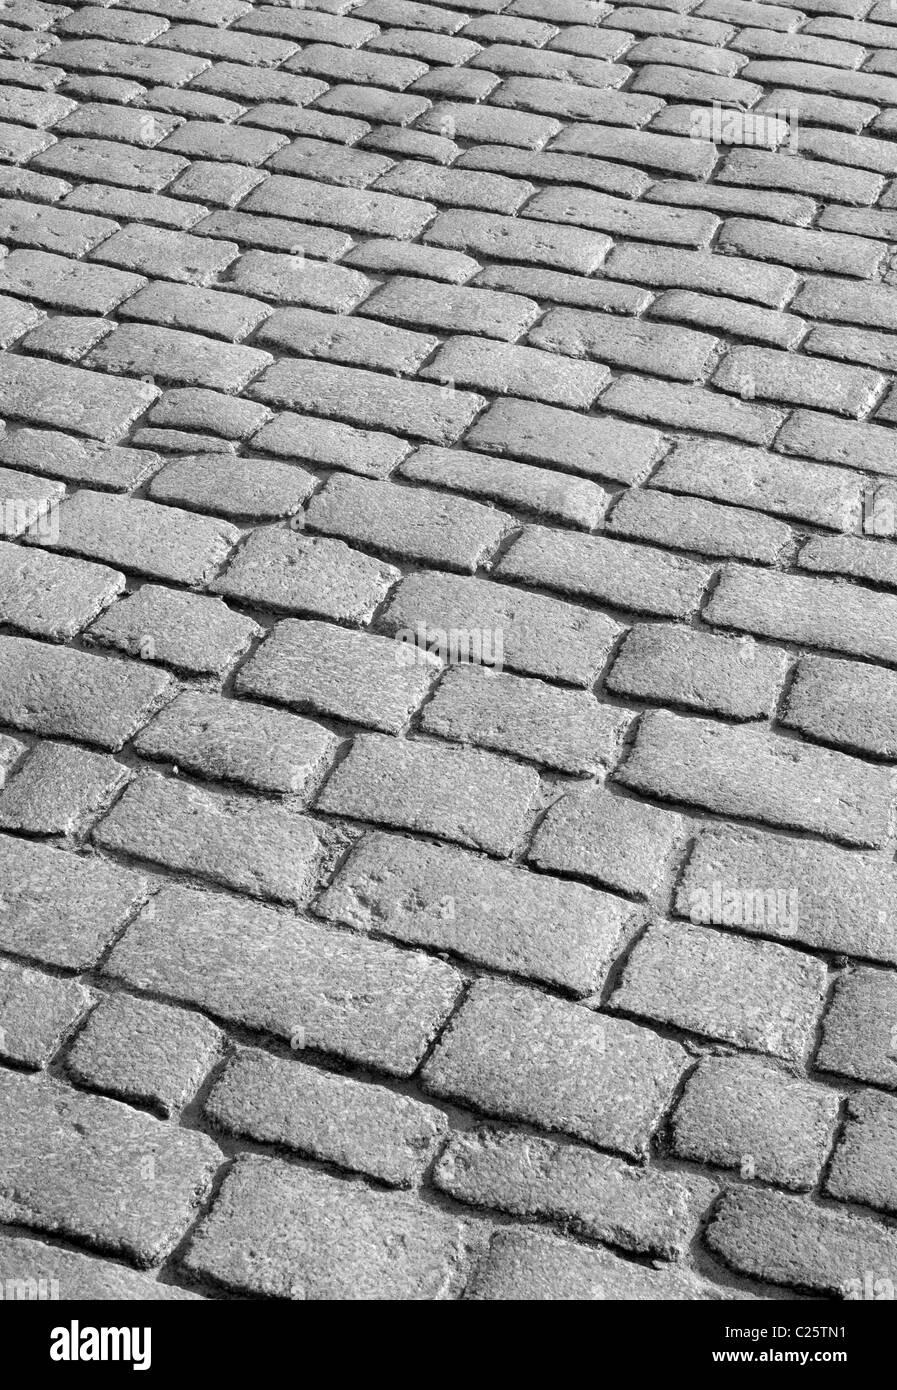 Old English cobblestone road close up. - Stock Image